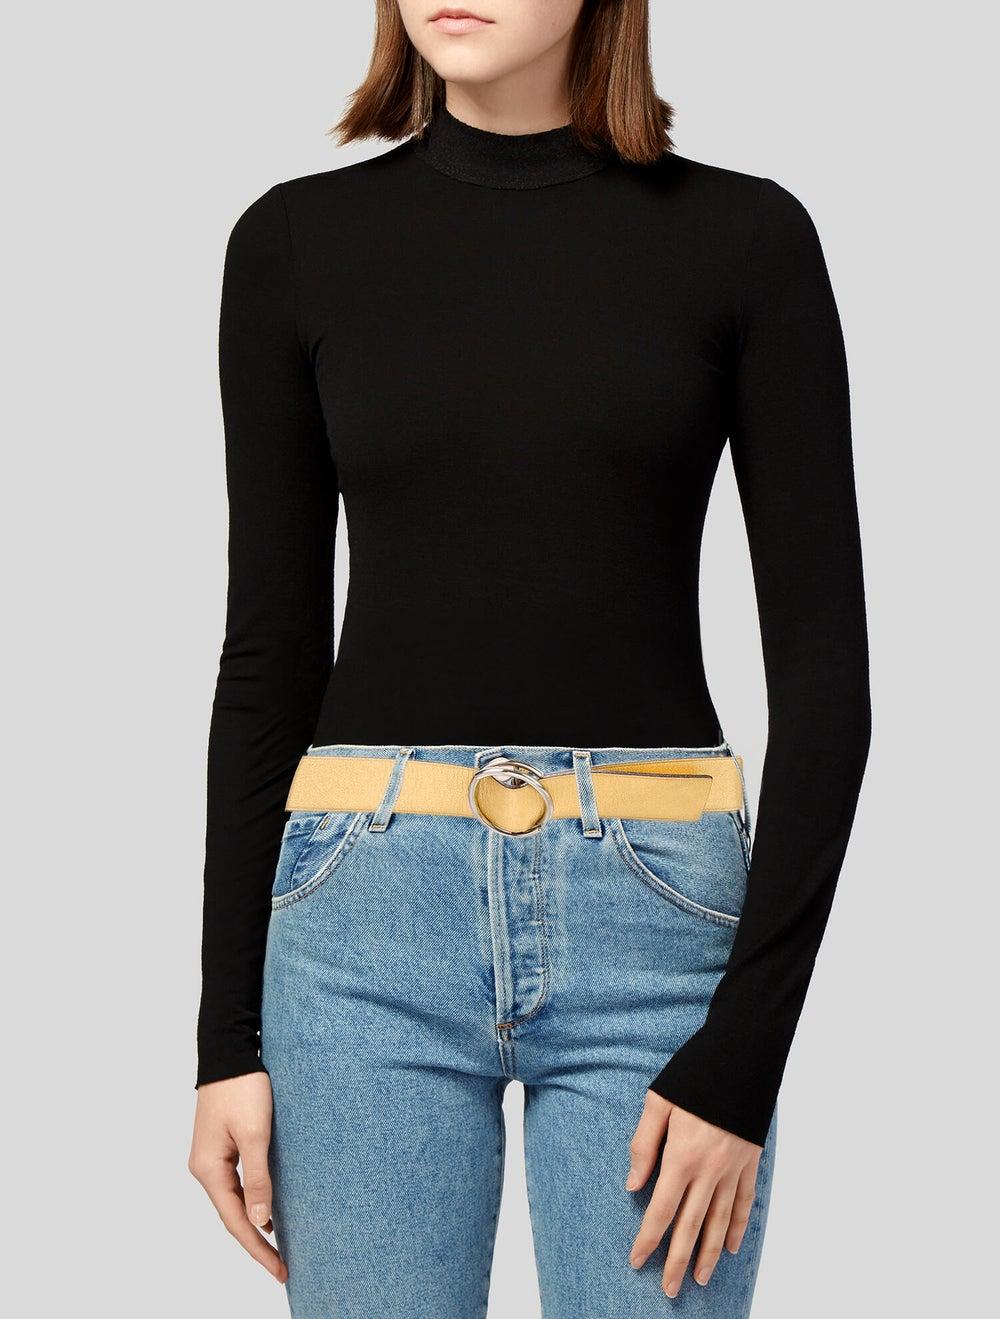 Prada Leather Belt Gold - image 2